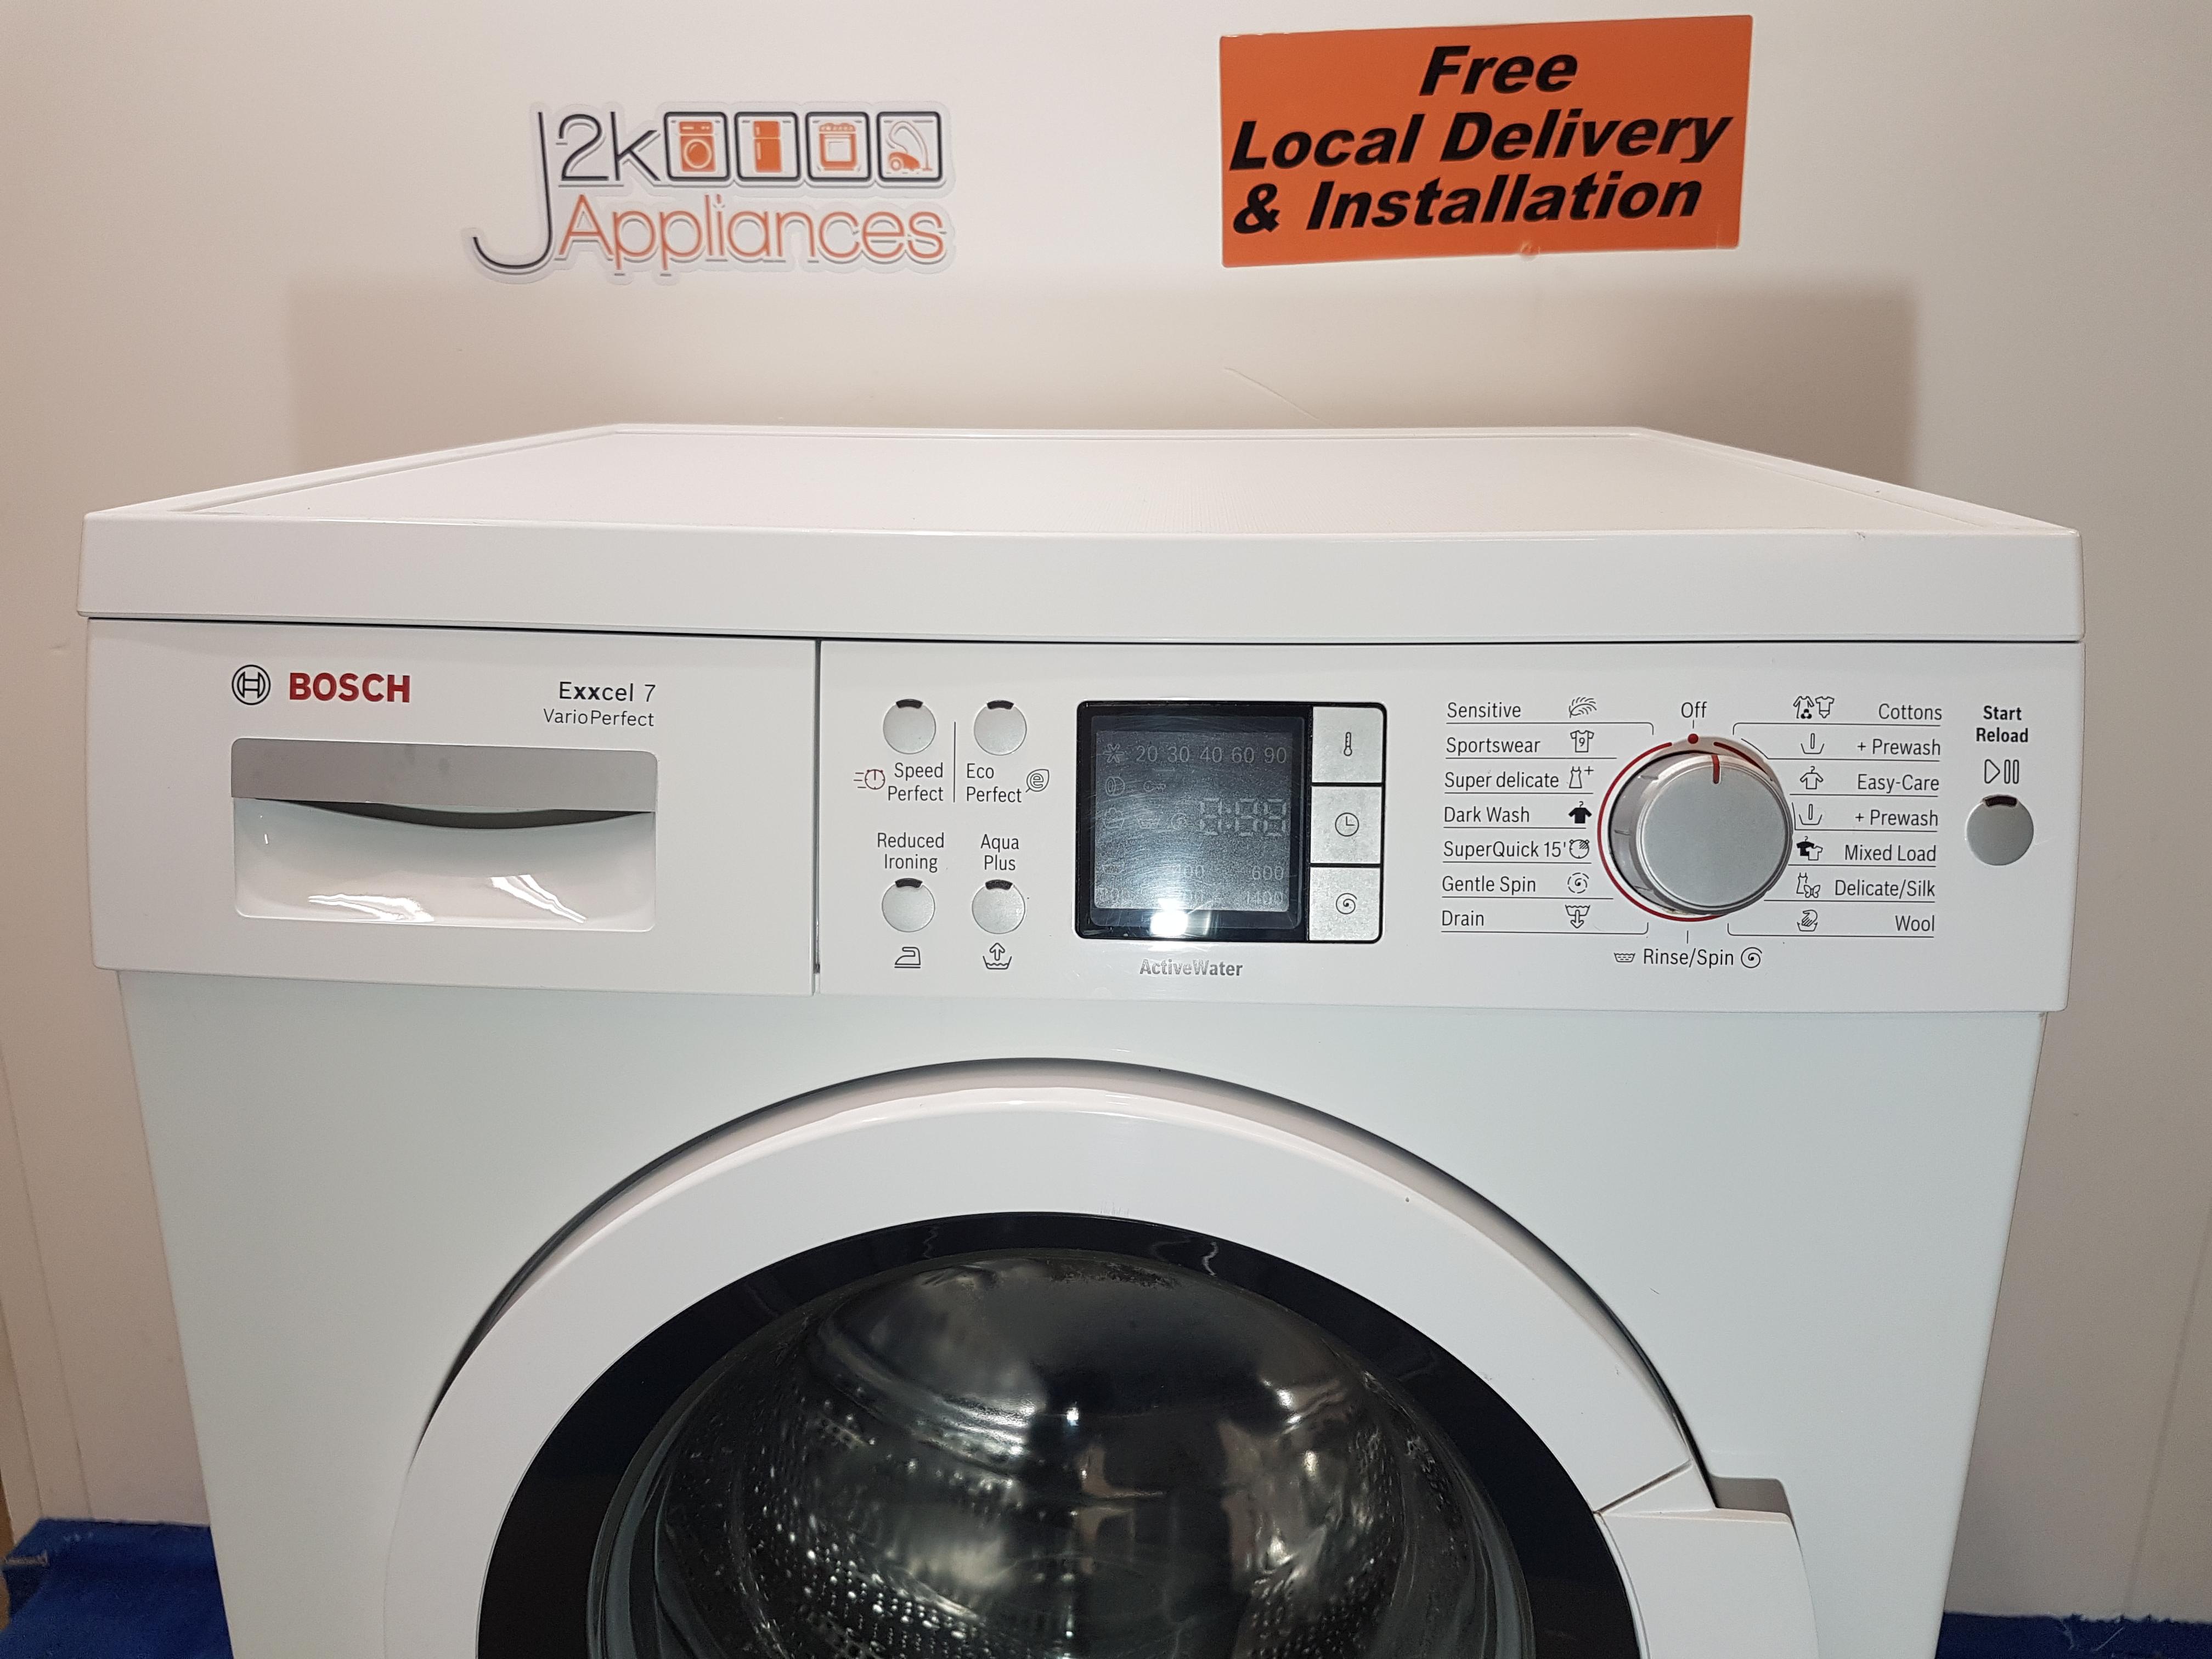 WM196-Bosch Excell Vario Perfect 1400 Spin 7kg Washing Machine